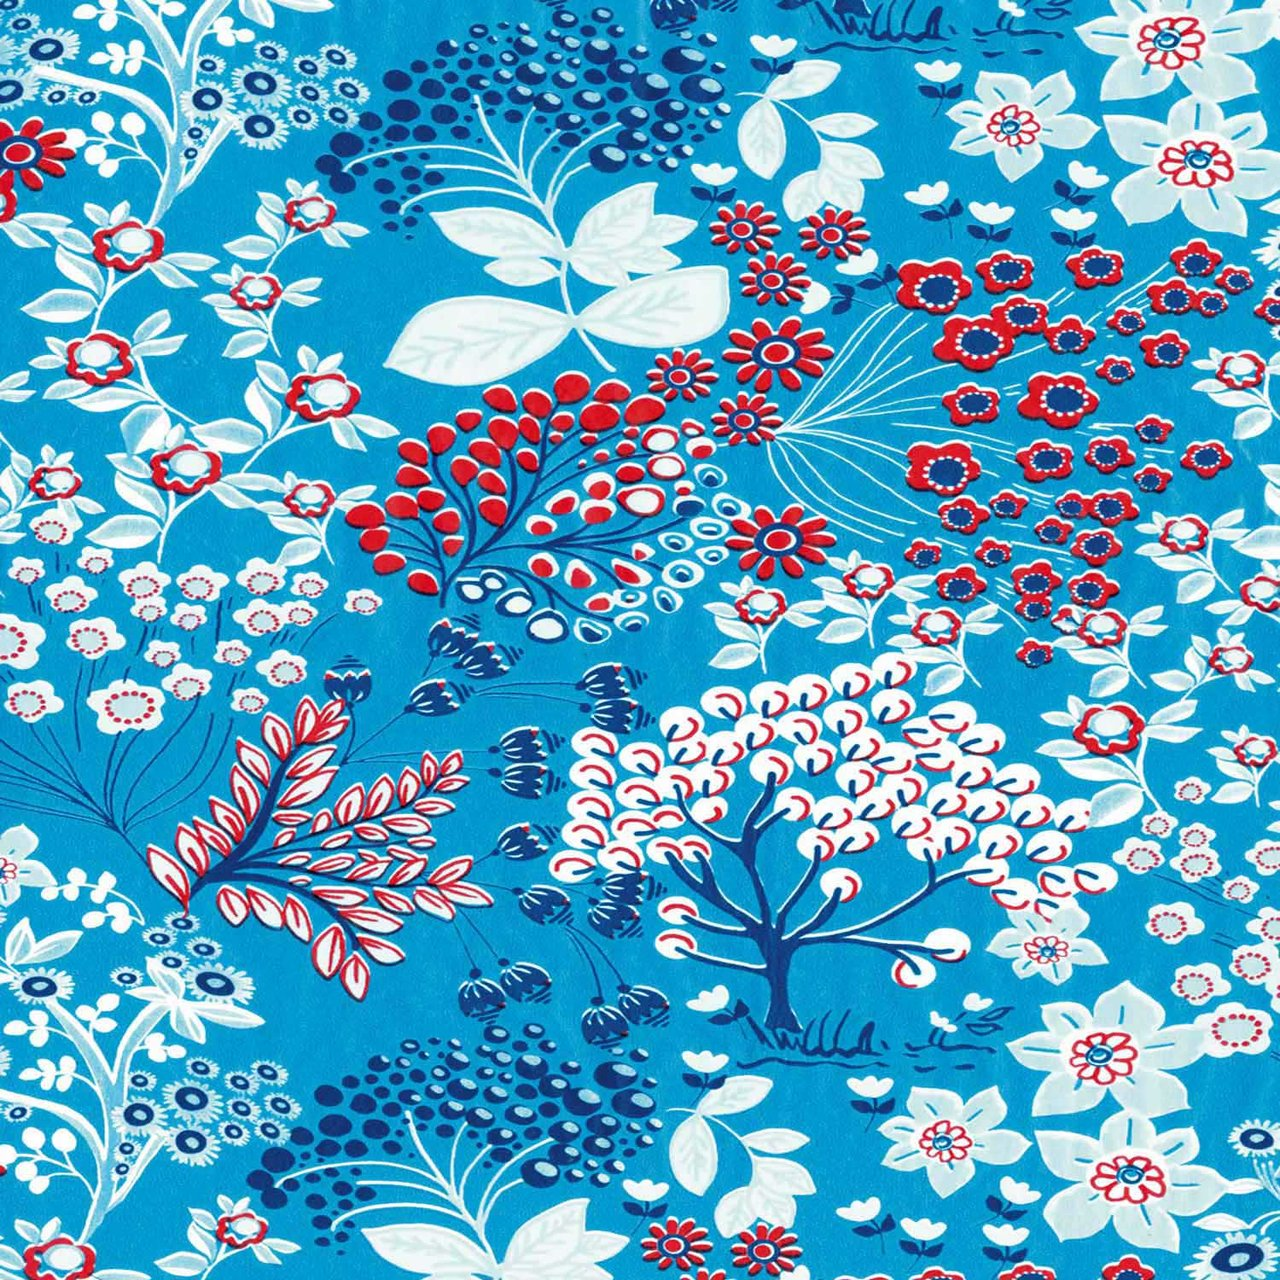 décopatch Papier Garten blau 3 Bogen